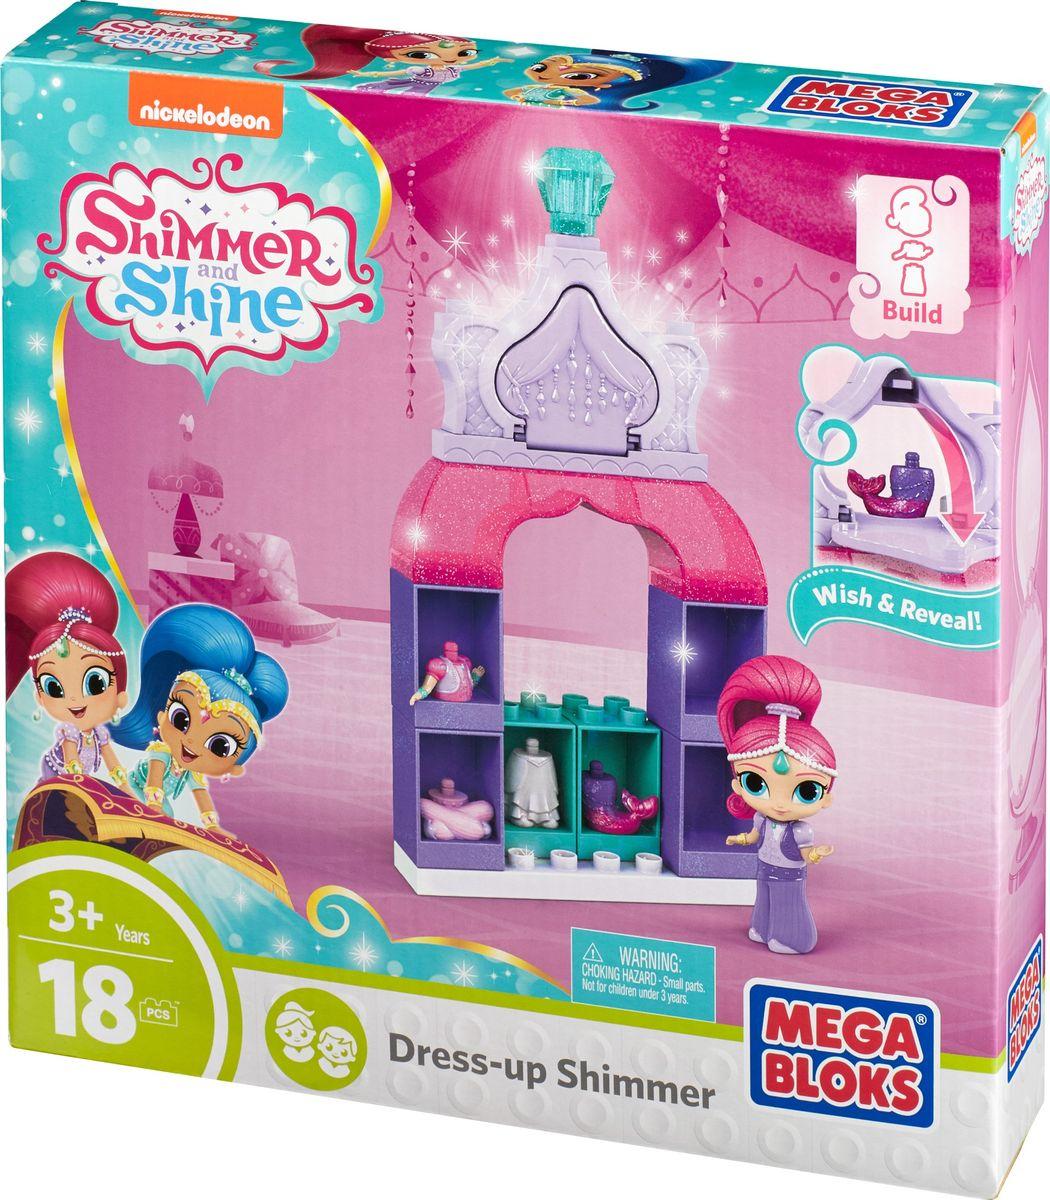 Mega Bloks Shimmer & Shine Конструктор Джинники-модницы Dress-Up Shimmer аксессуары для кукол mega bloks табличка для имени миньоны